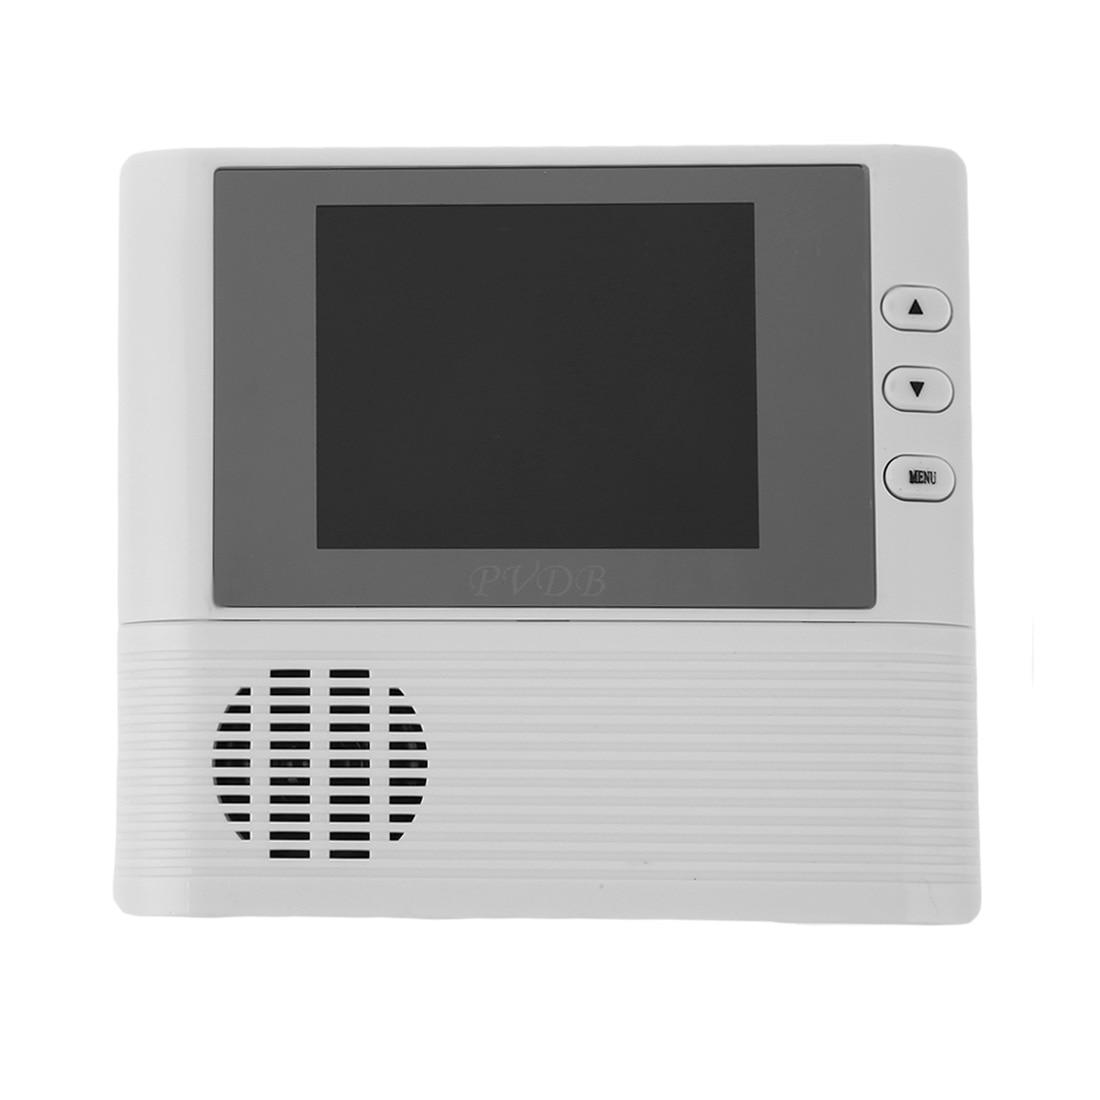 Digital Viewfinder Judas 2.8 LCD 3x Zoom door bell for safety Drop ShippingDigital Viewfinder Judas 2.8 LCD 3x Zoom door bell for safety Drop Shipping